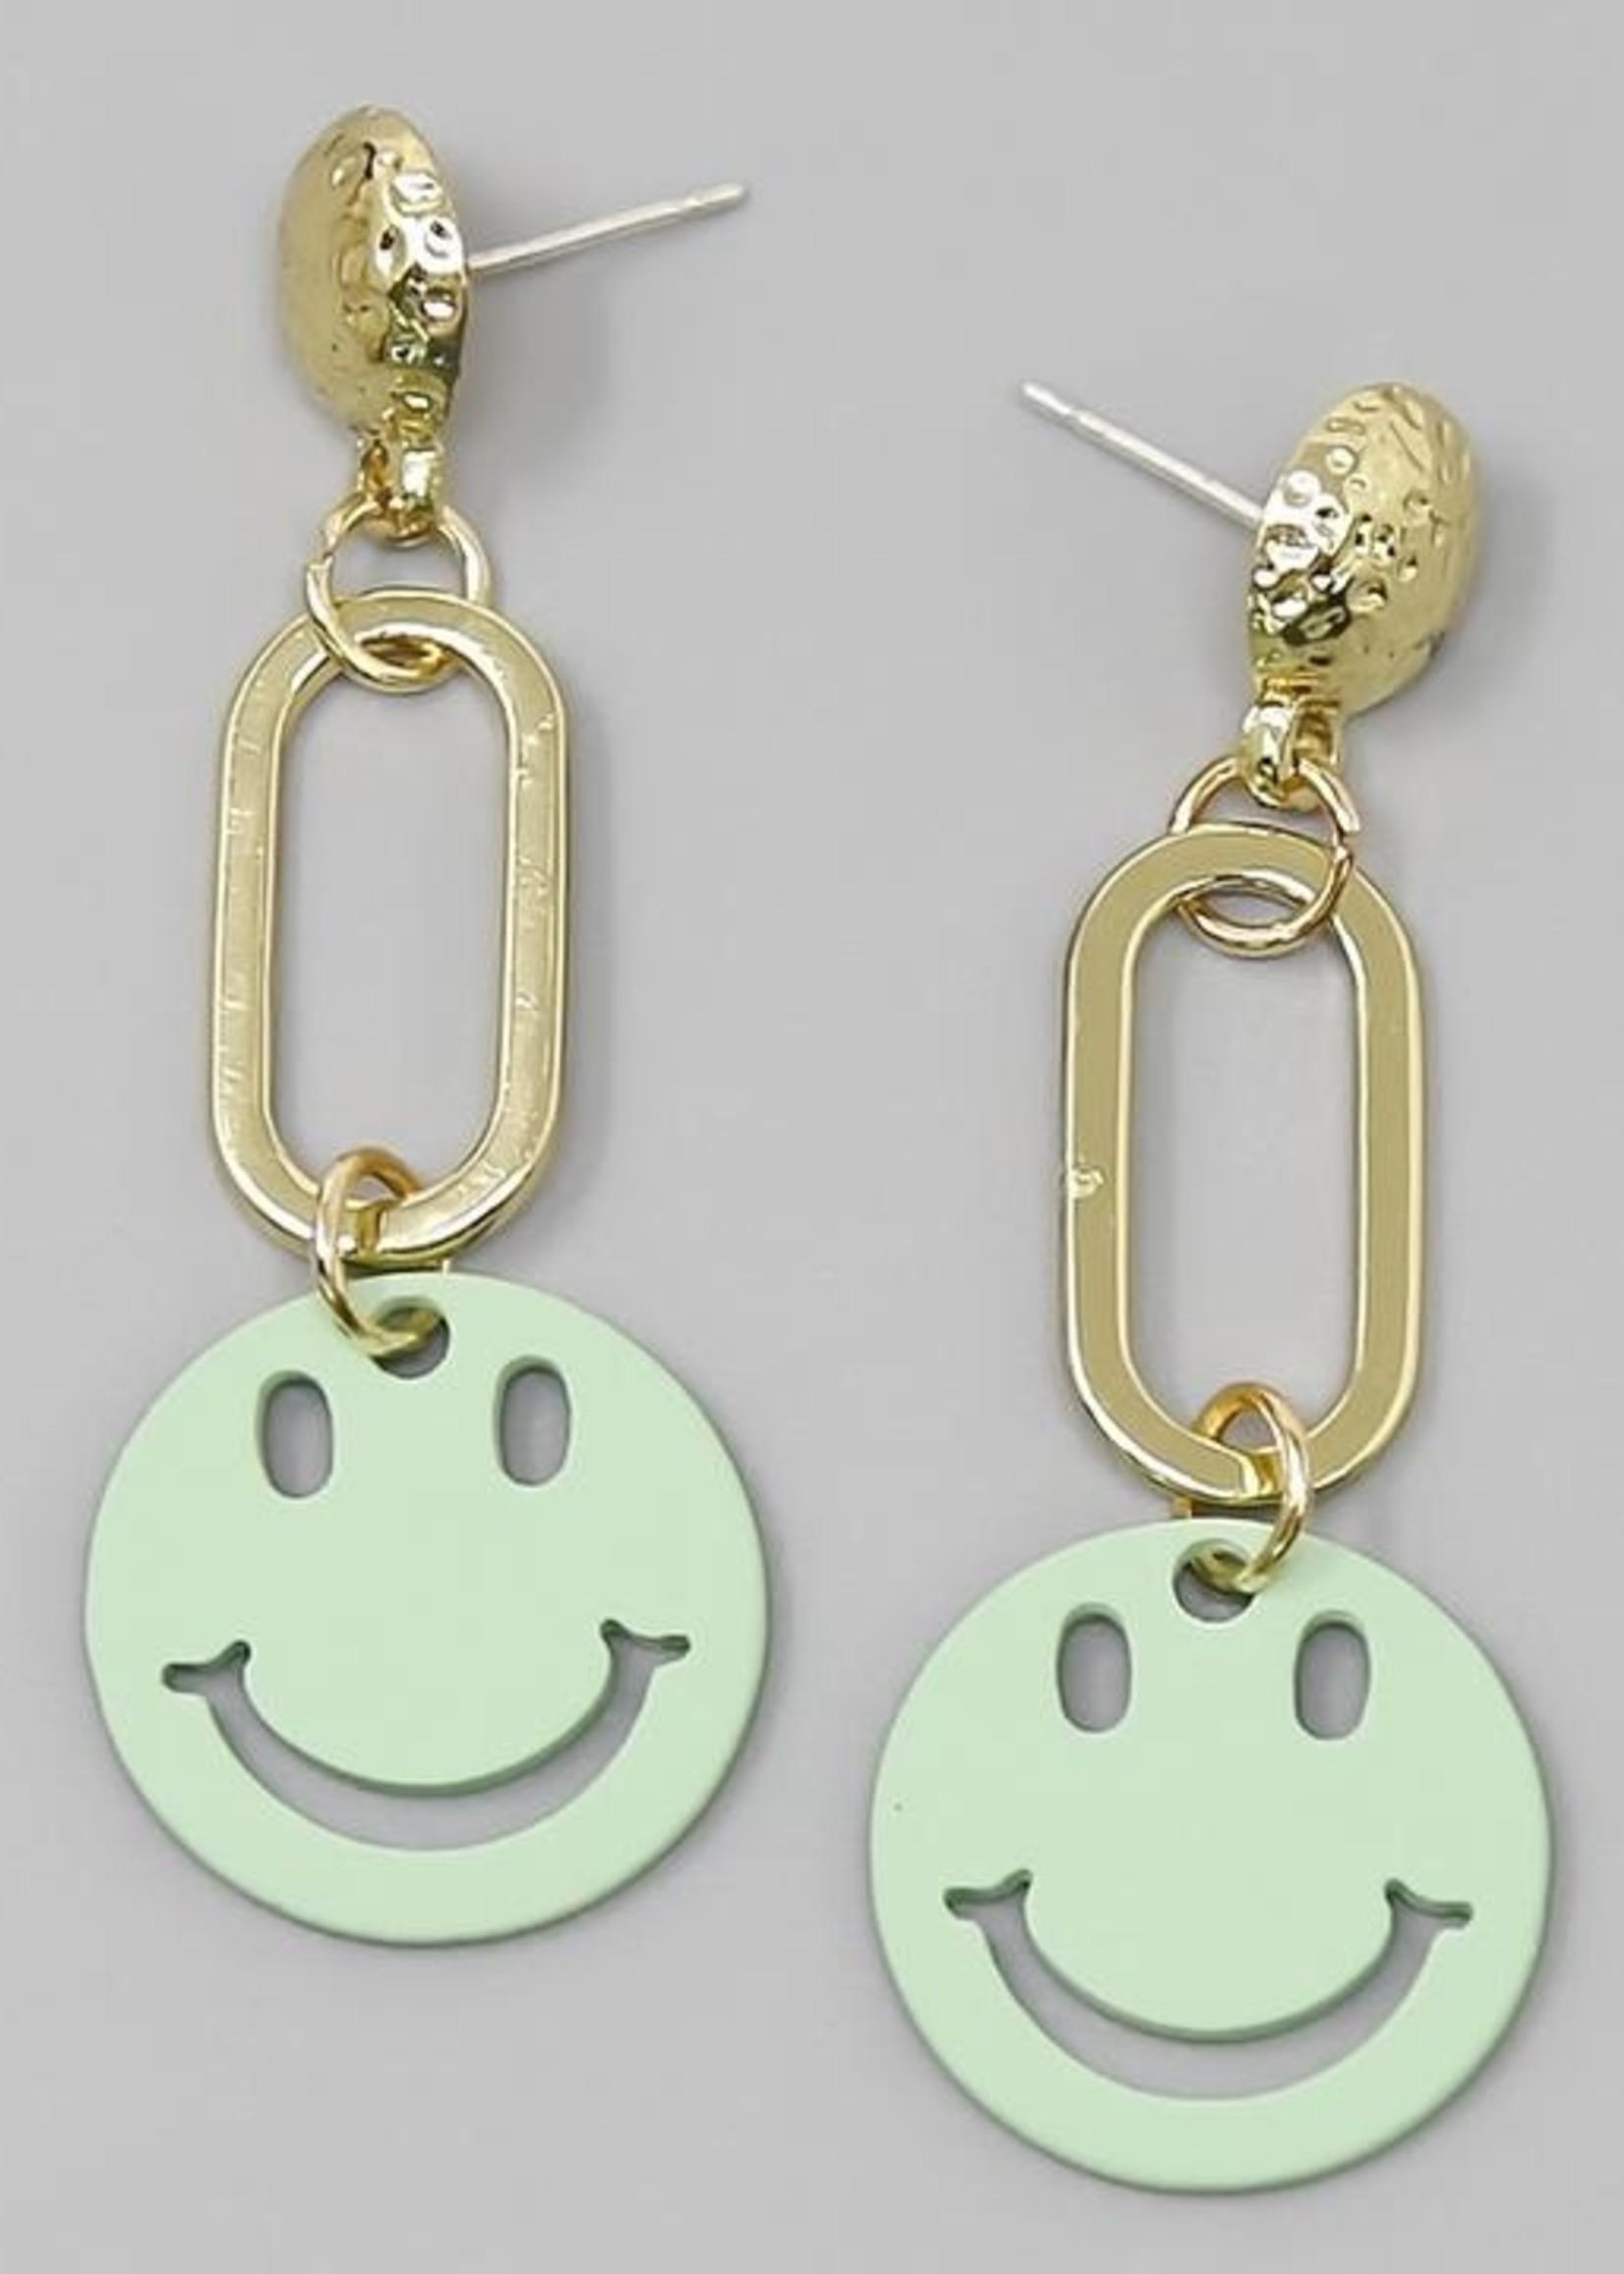 Smiley Charm Earrings